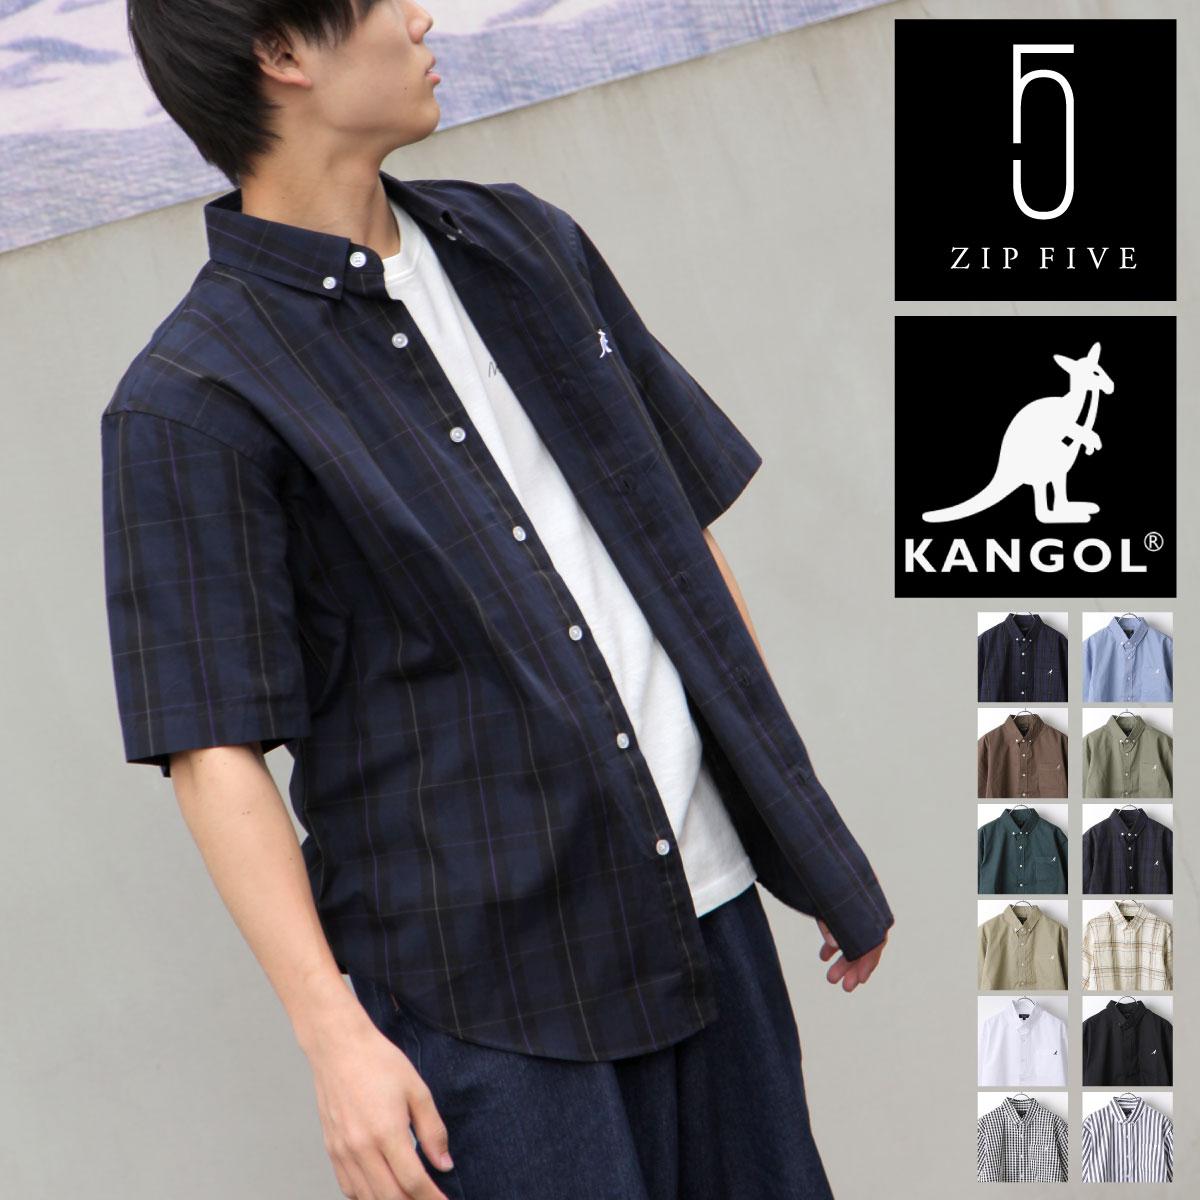 KANGOL短袖襯衫 特注款 KANGOL 袋鼠 0